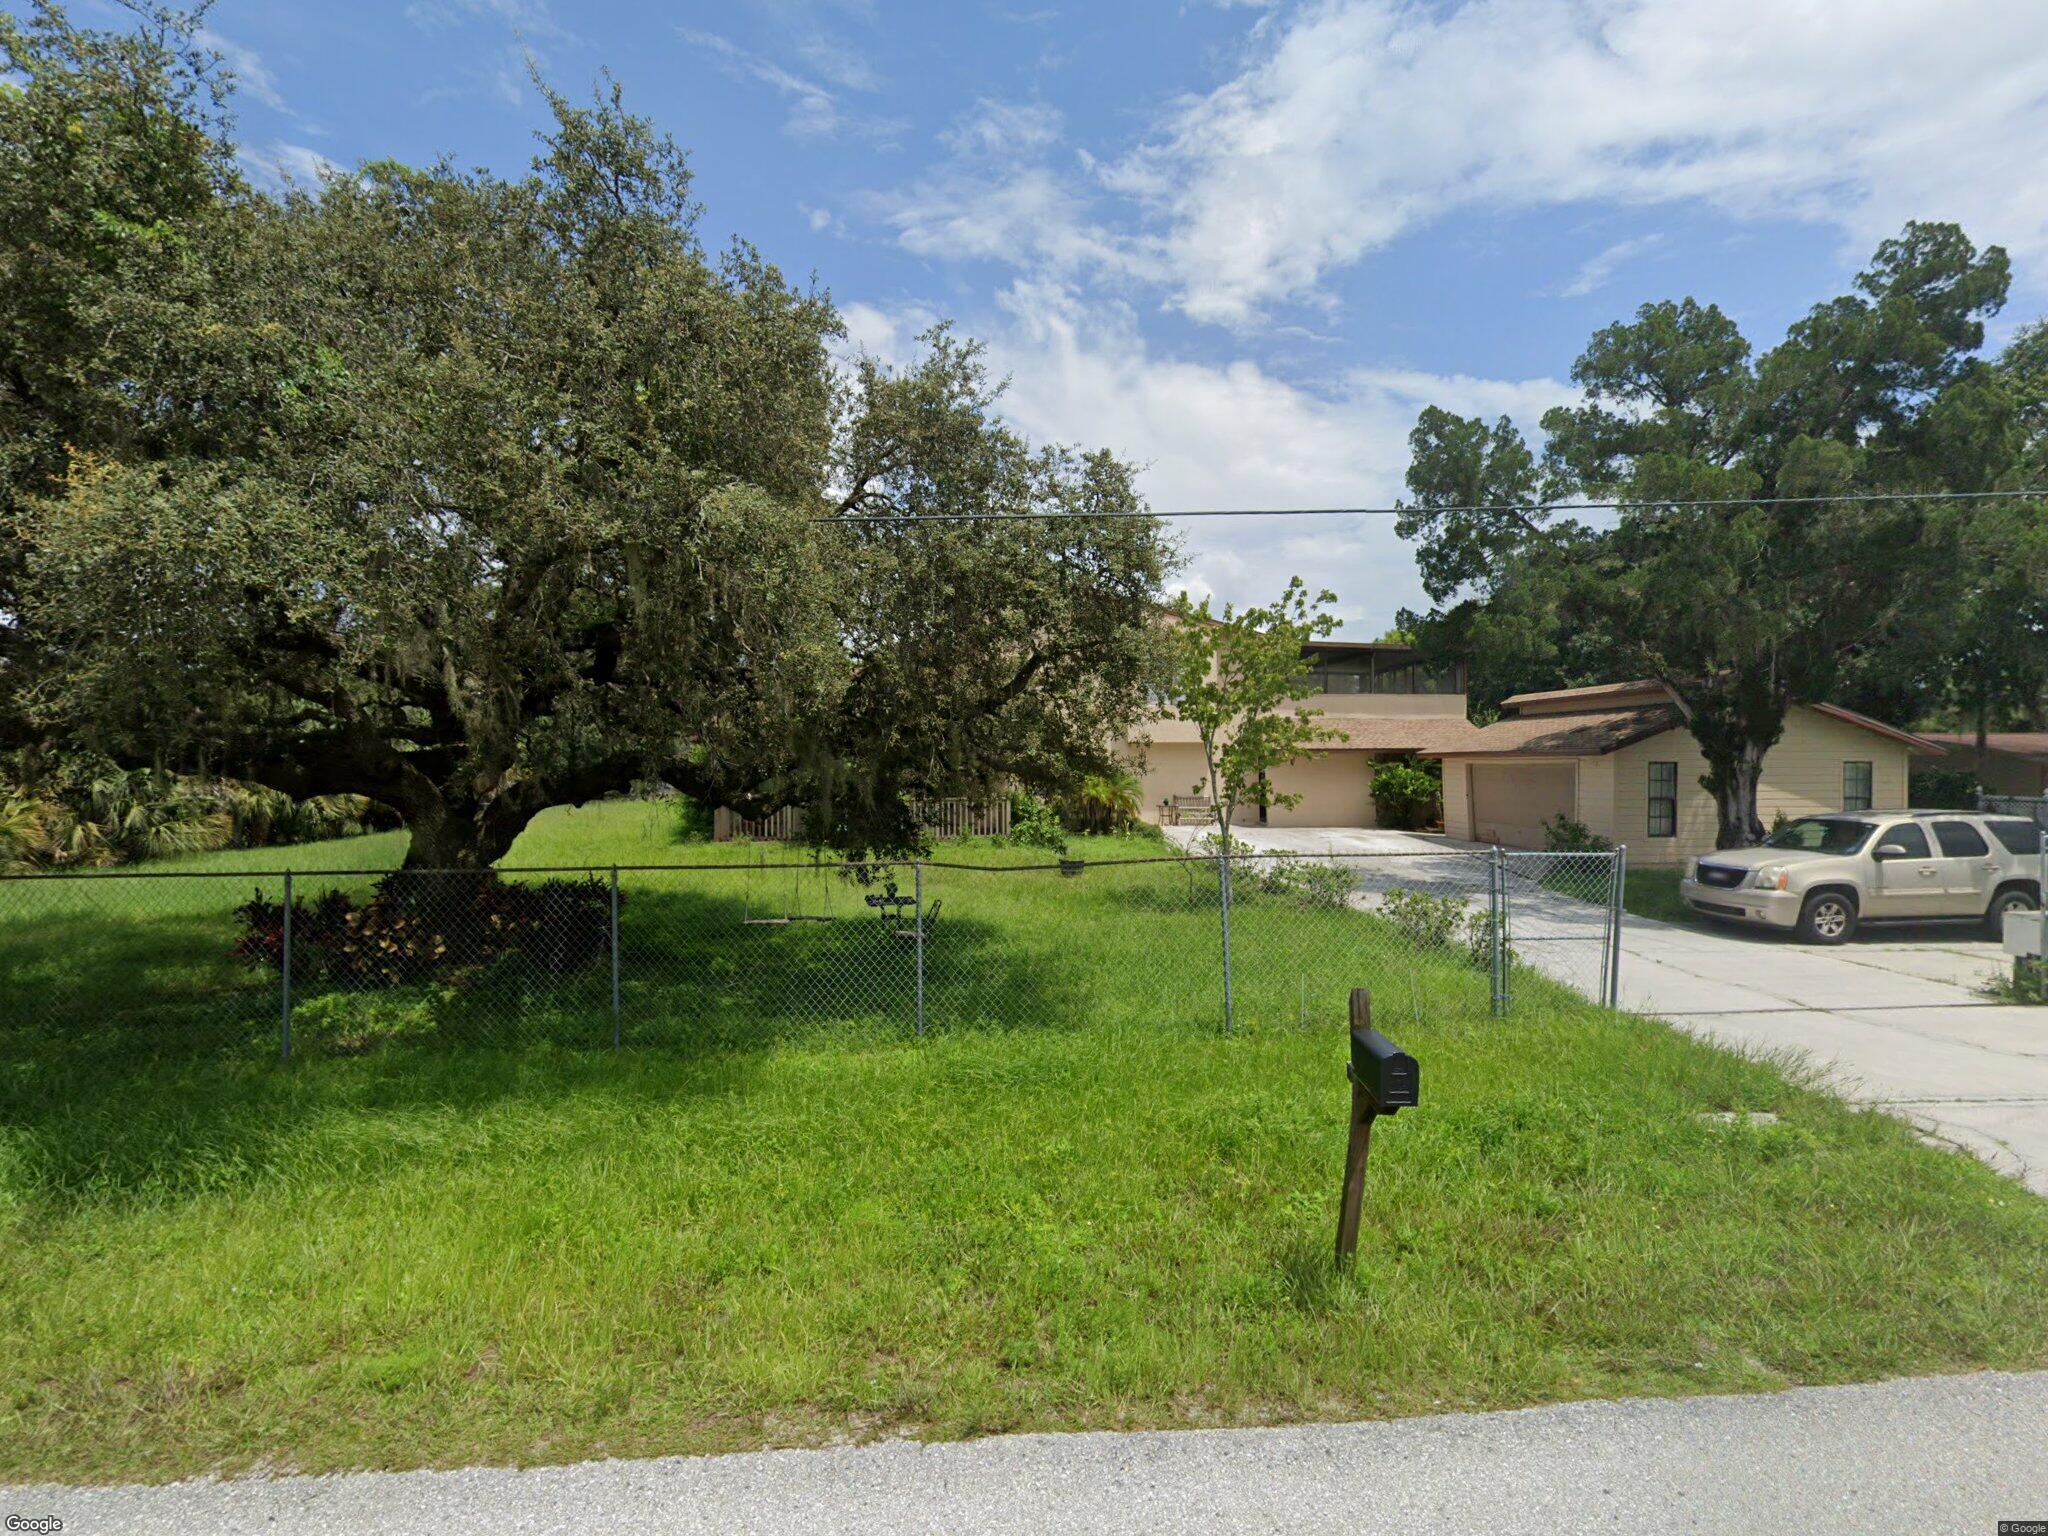 2701 53rd St, Sarasota, FL 34234 - Foreclosure   Trulia